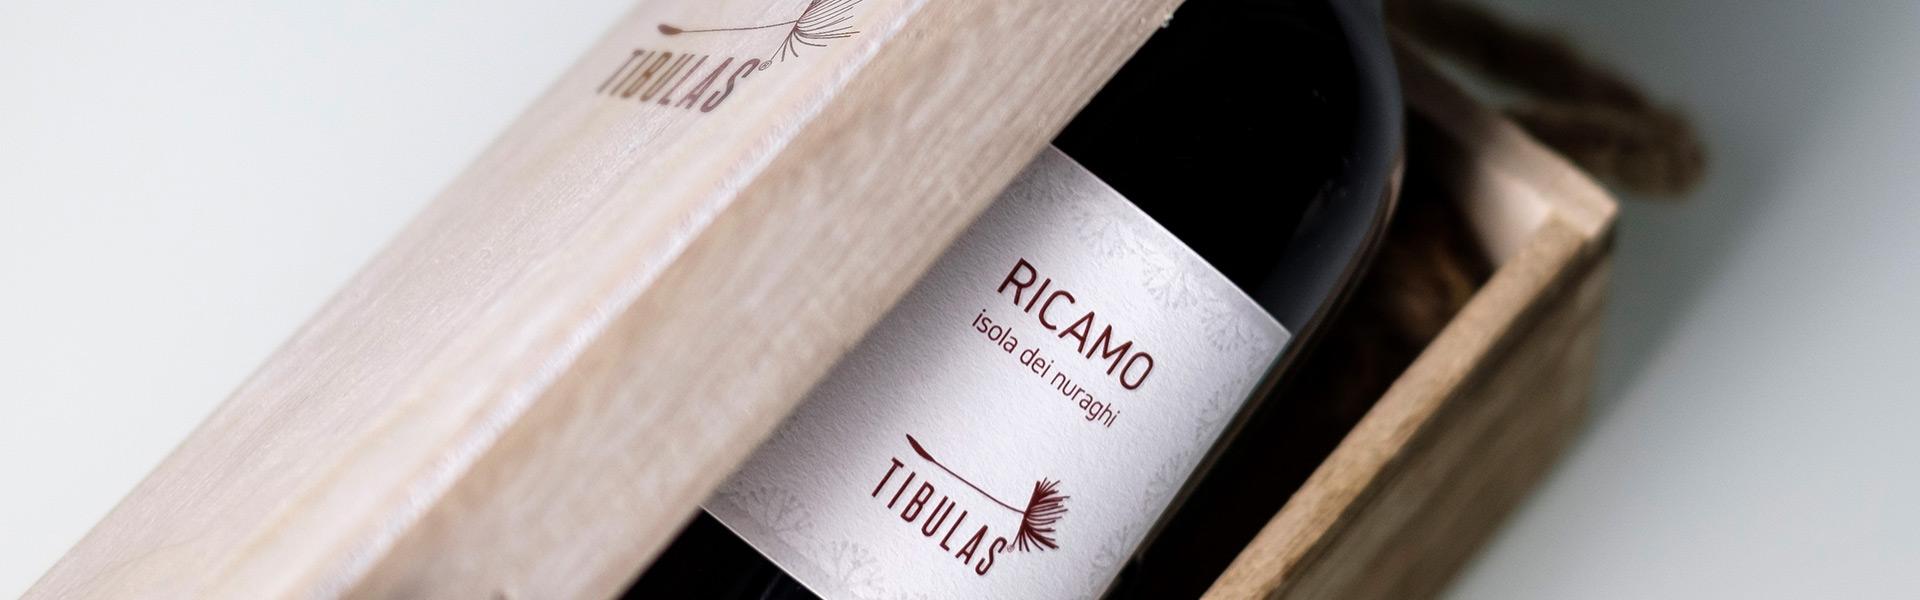 Ricamo by Tibulas - Packaging design (desktop)